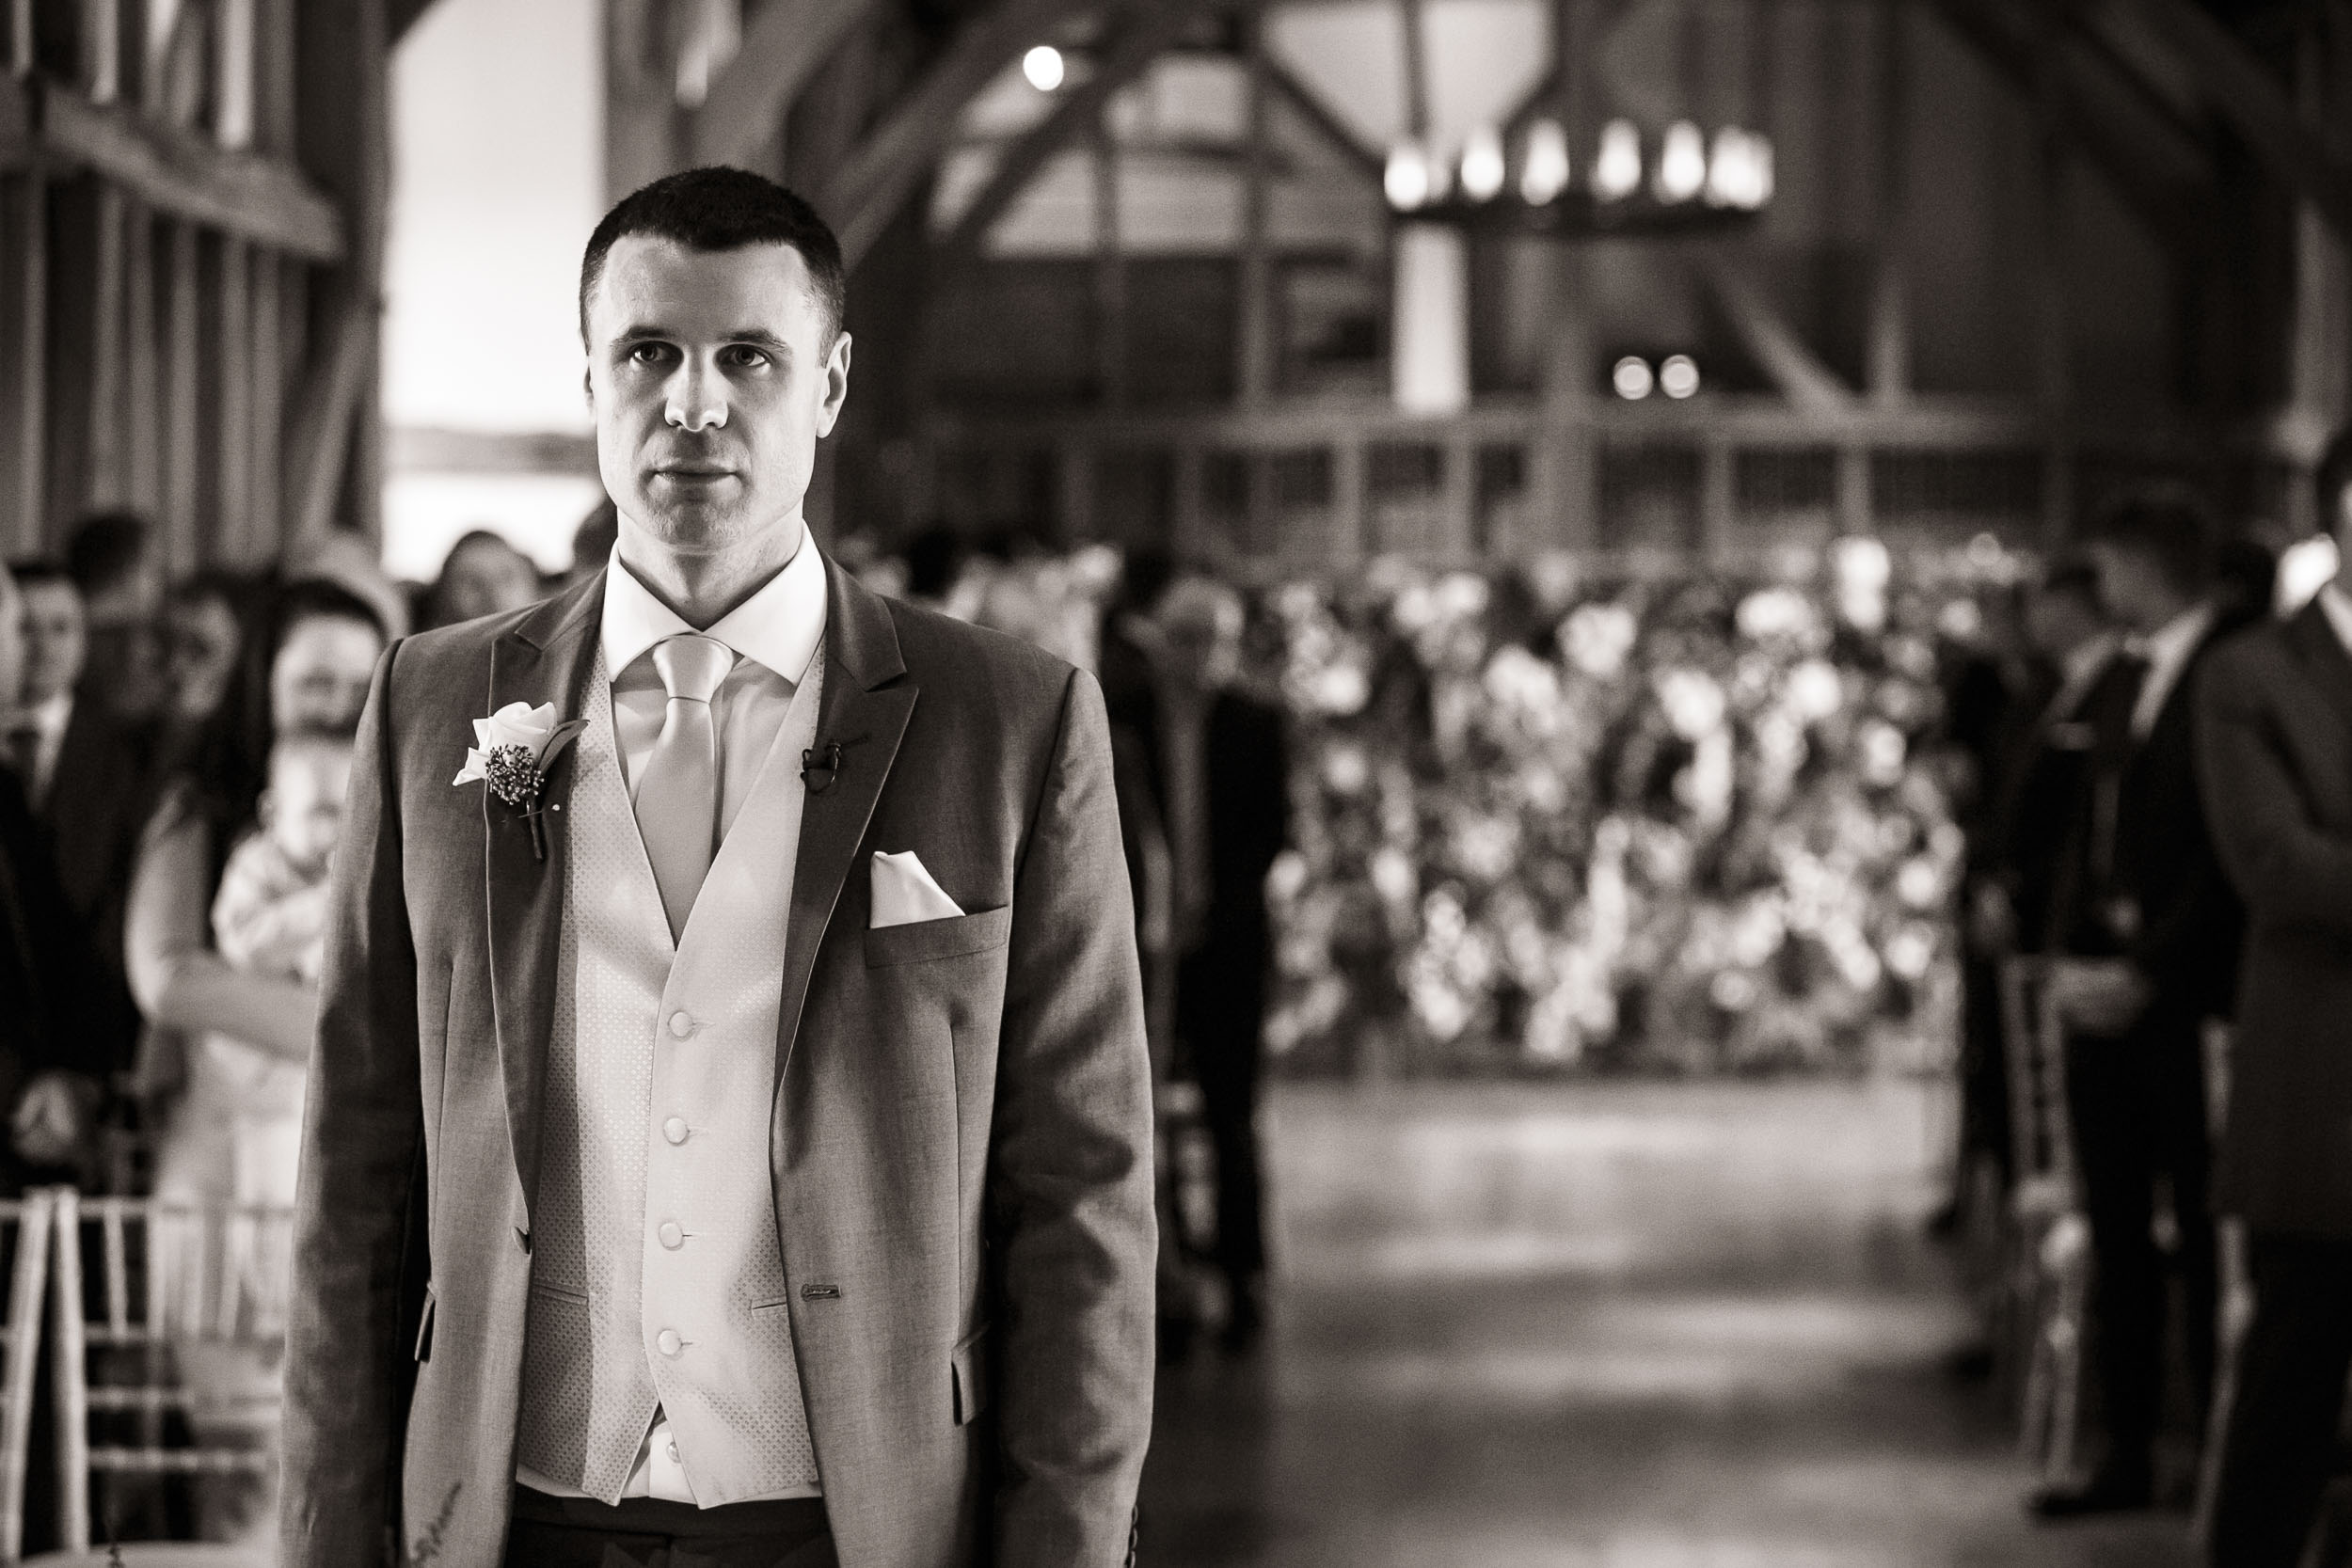 micklefield-hall-wedding-photographer 022.jpg